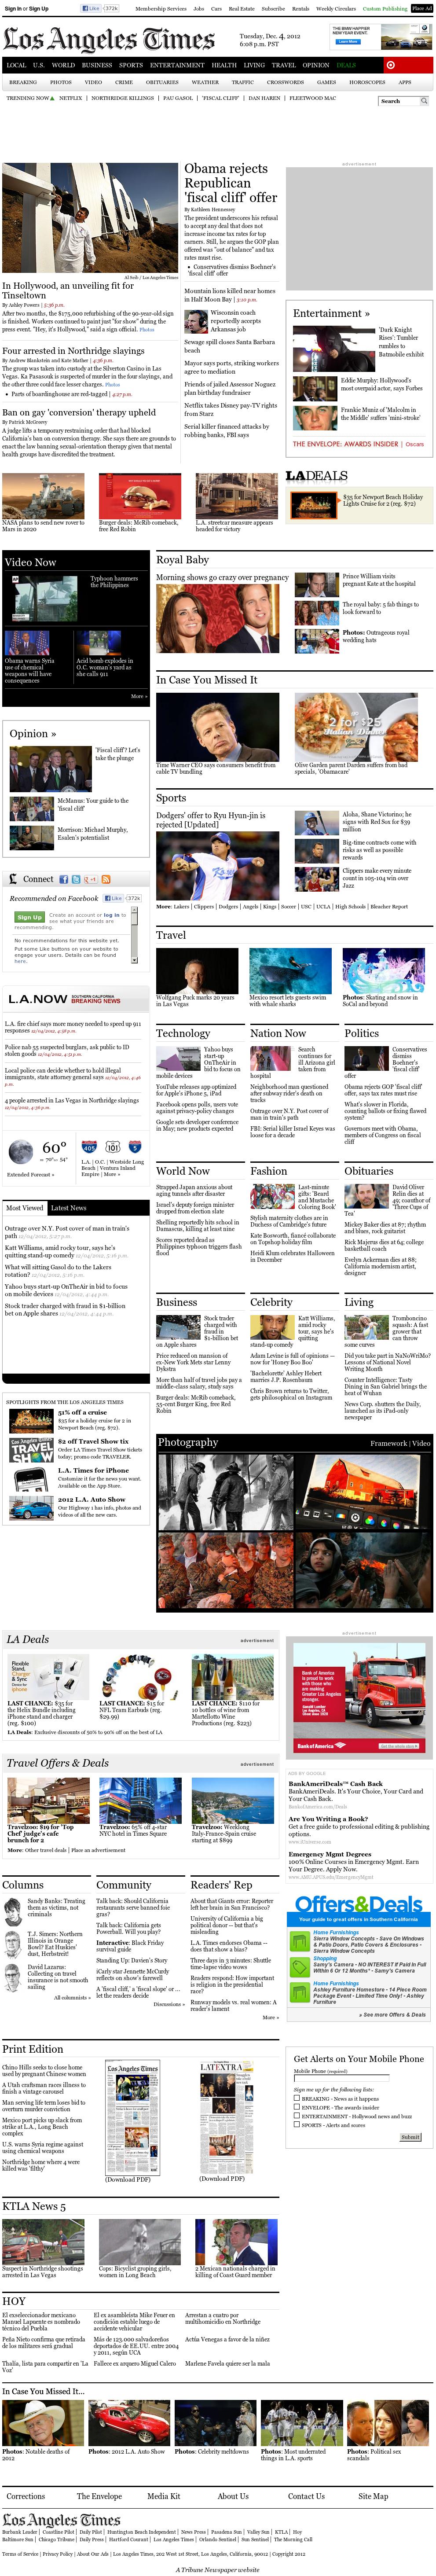 Los Angeles Times at Wednesday Dec. 5, 2012, 2:16 a.m. UTC